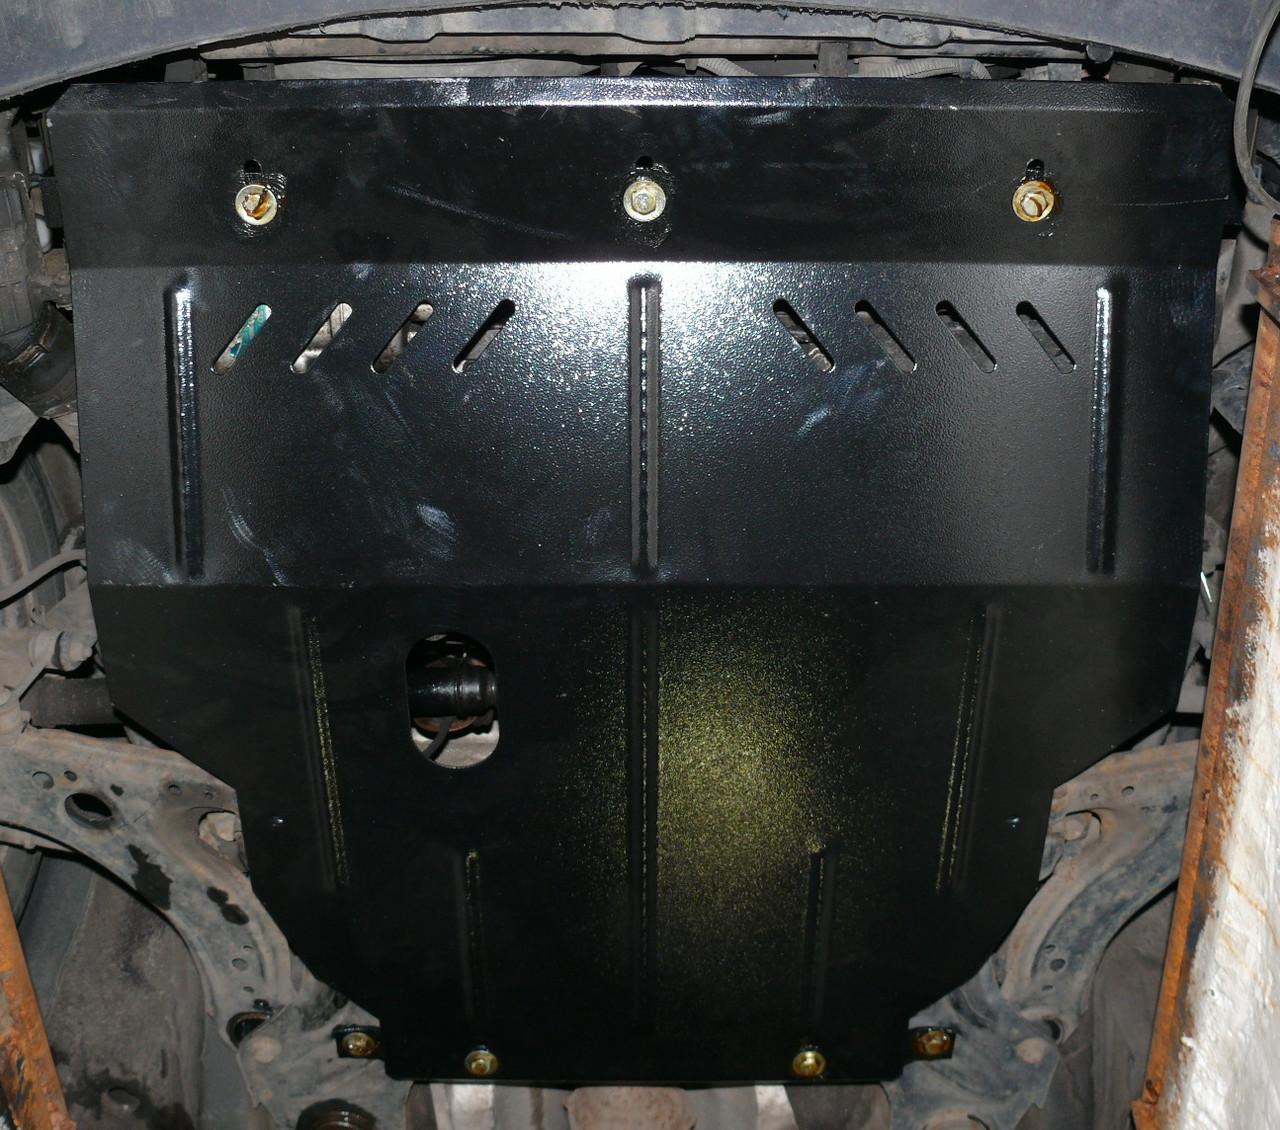 Защита картера (двигателя) и Коробки передач на Бриллианс М2 (Brilliance M2) 2006 - ... г (металлическая/1.5)